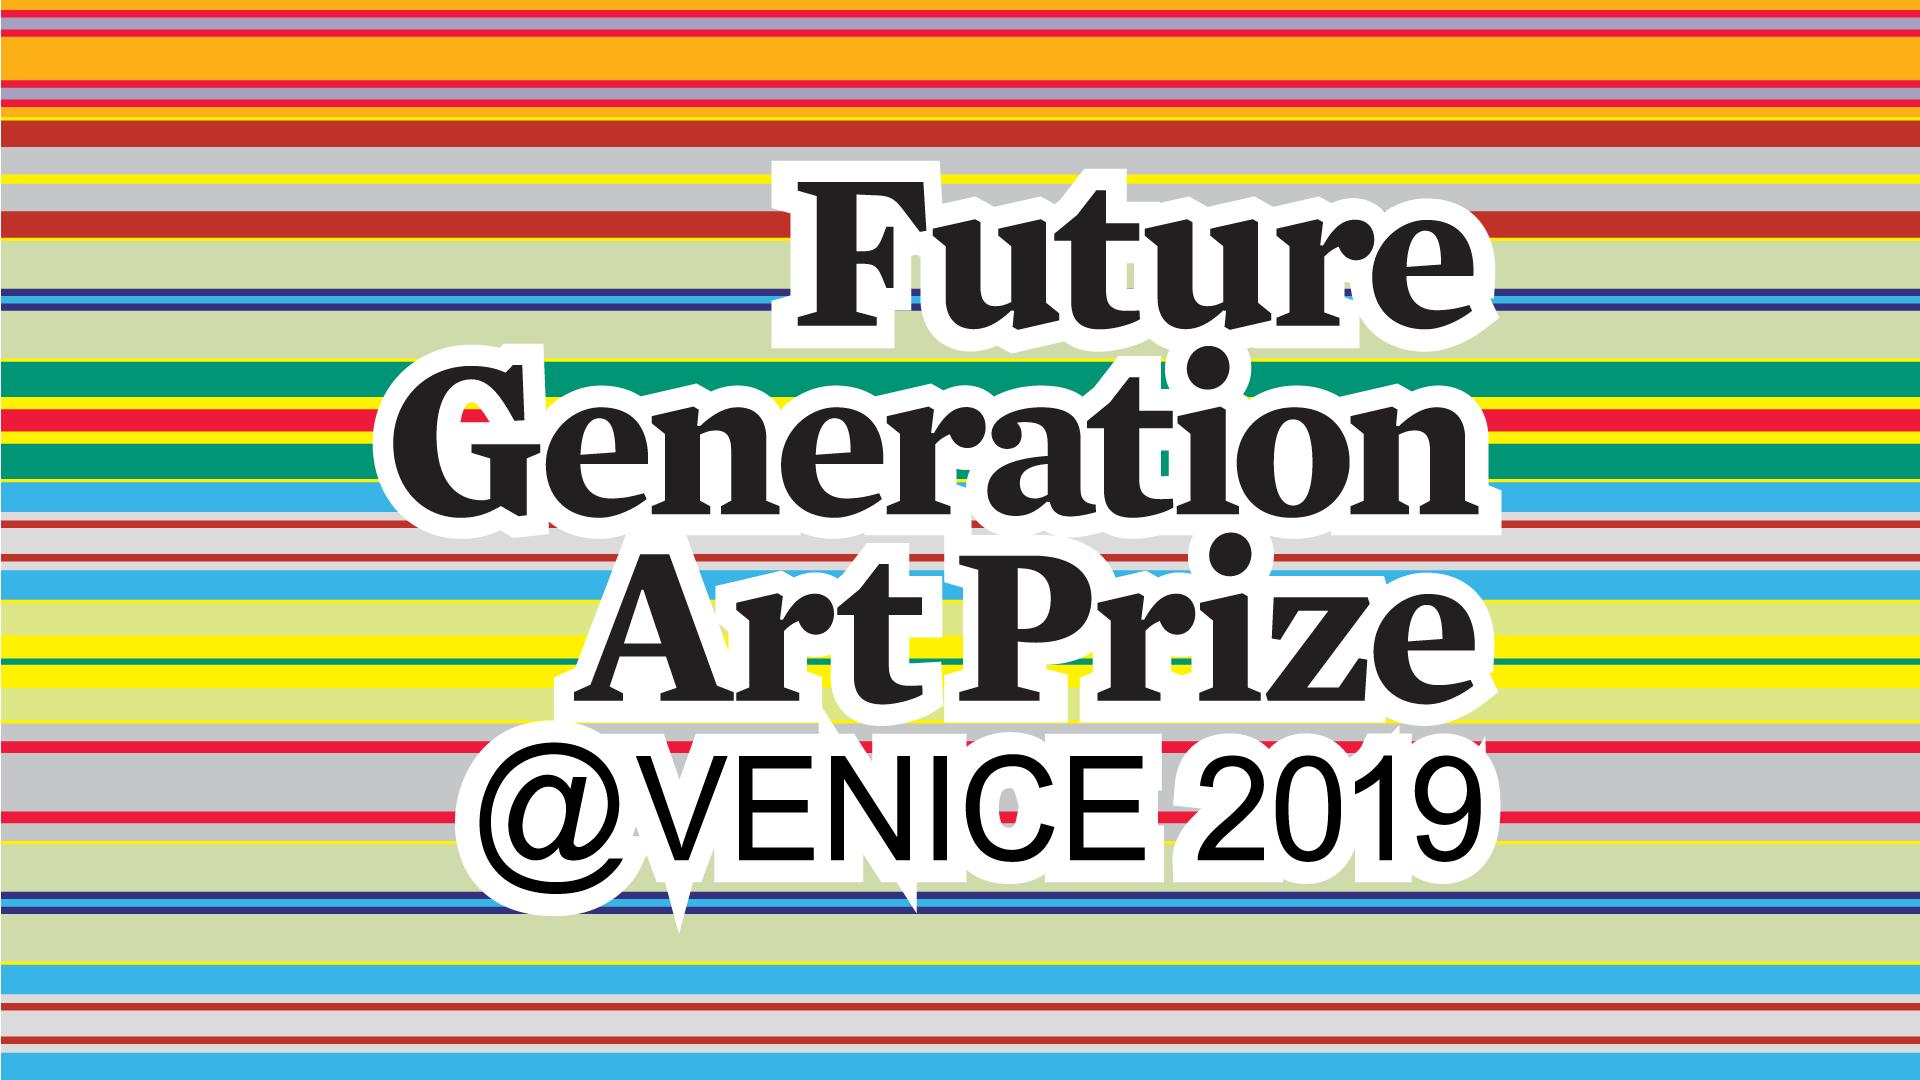 FUTURE GENERATION ART PRIZE @ VENICE 2019